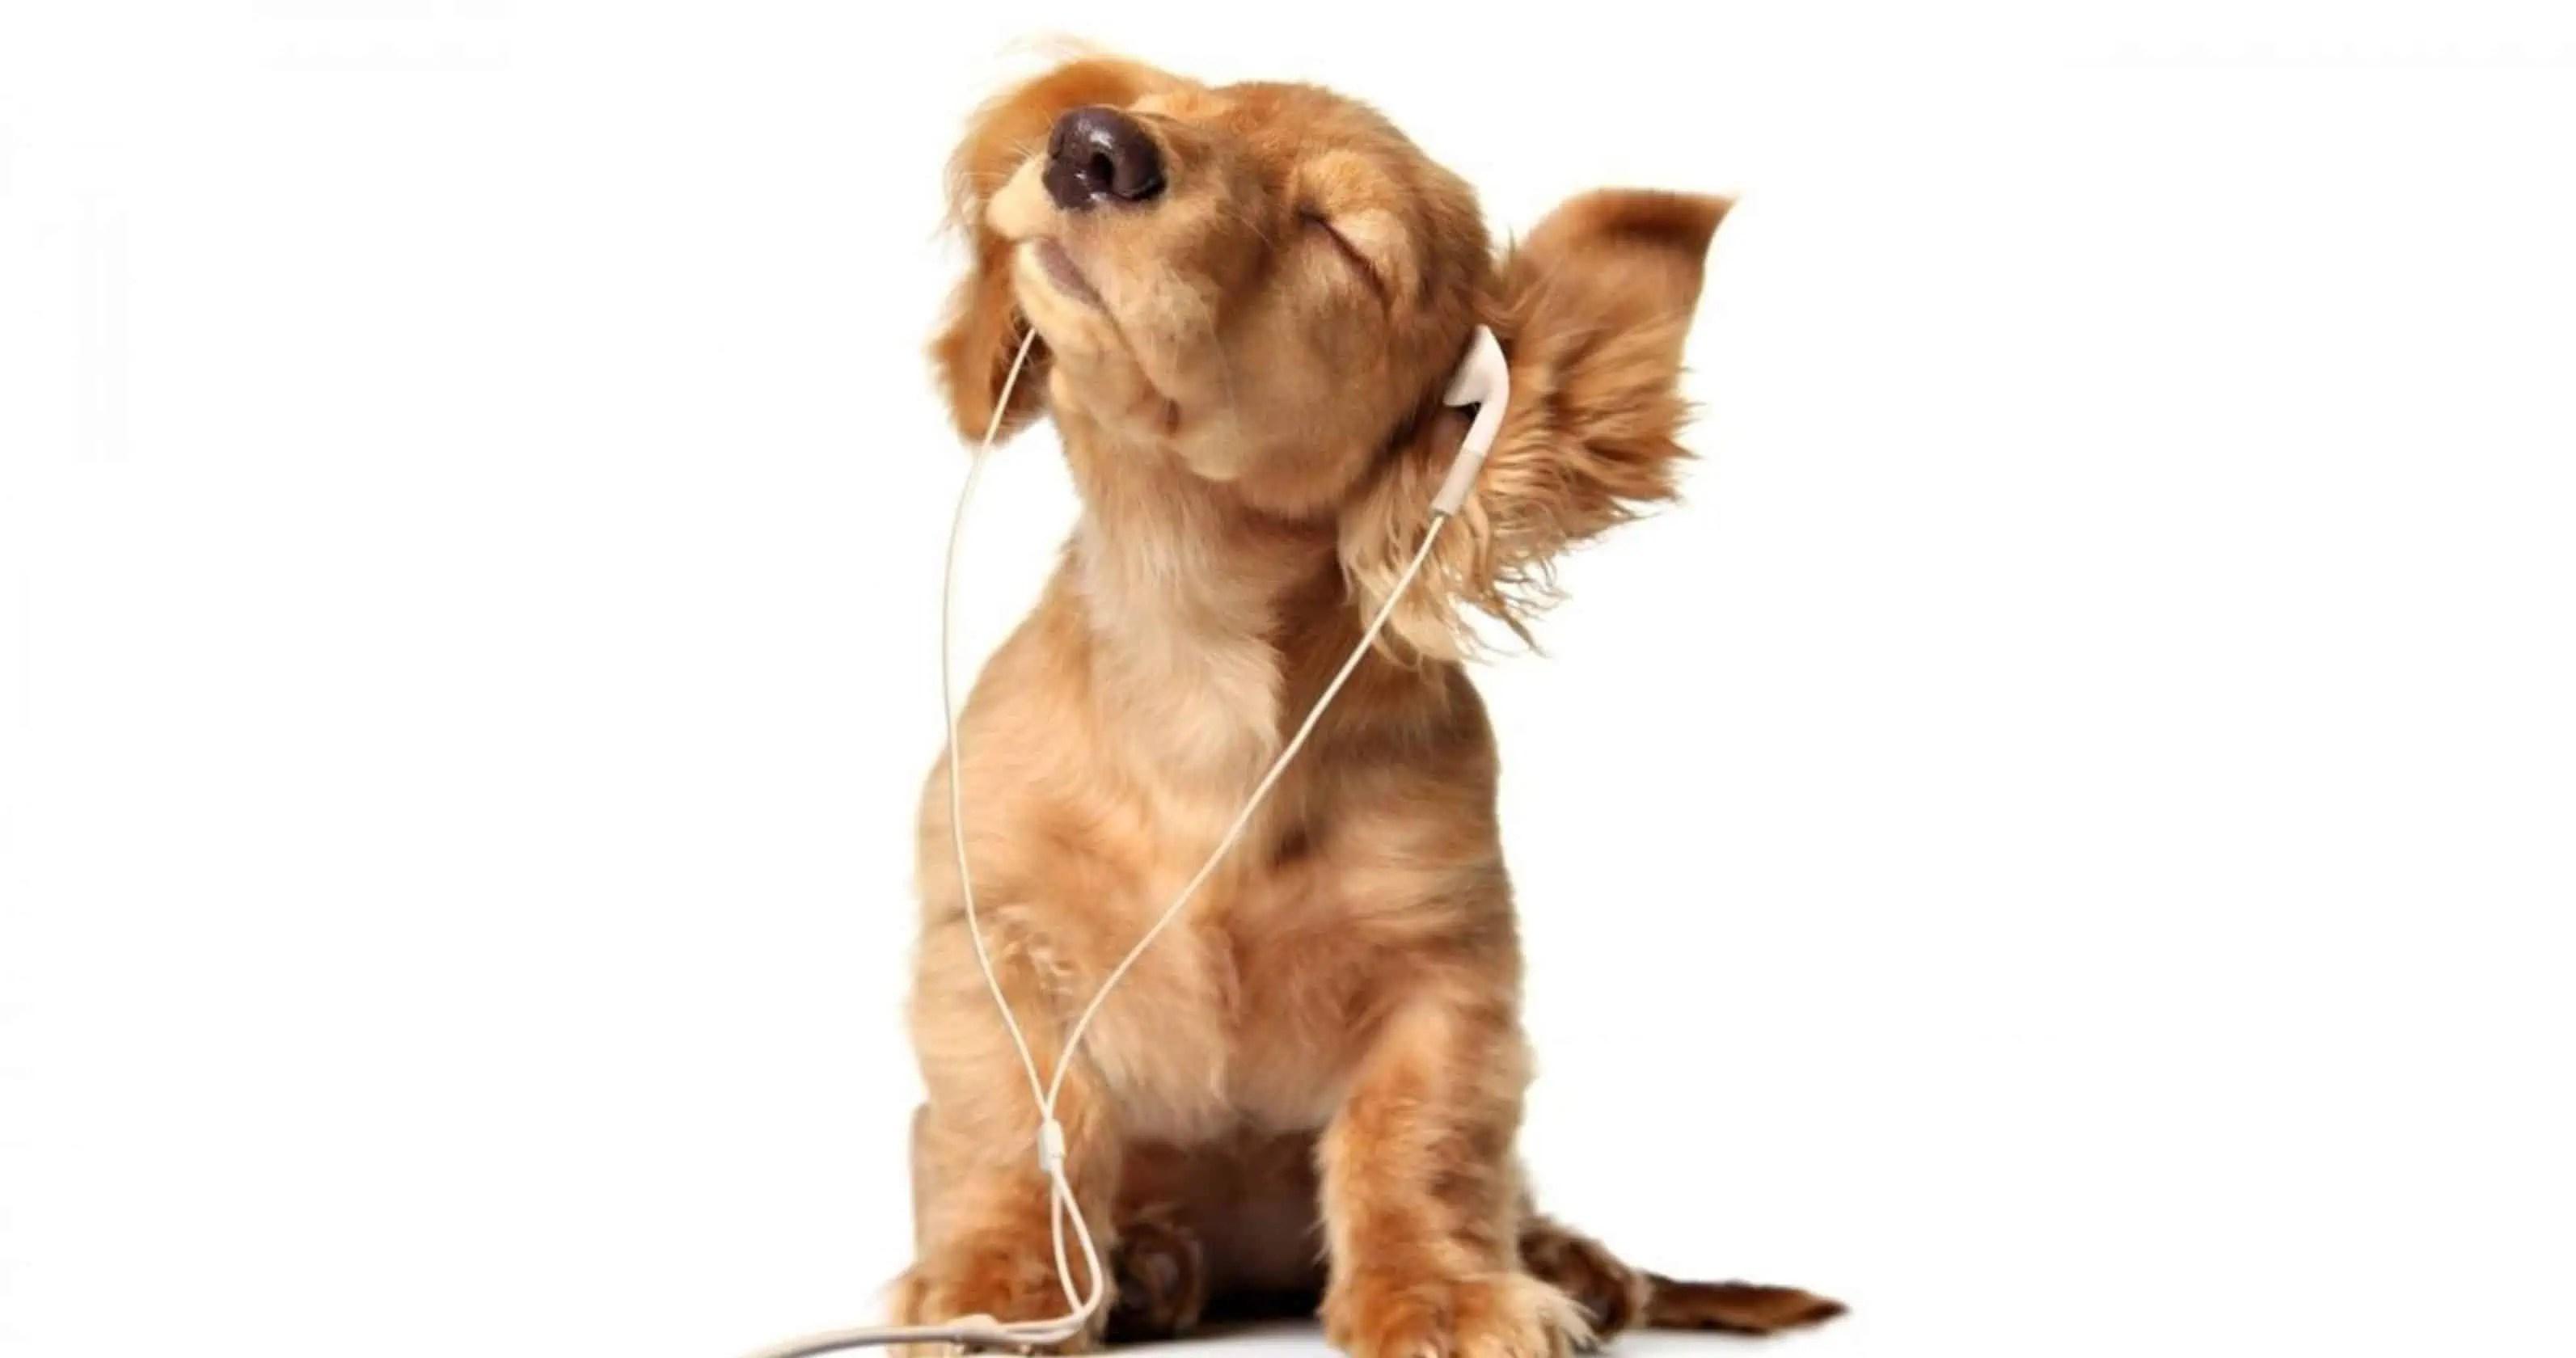 puppy-music_wallpprs.com_